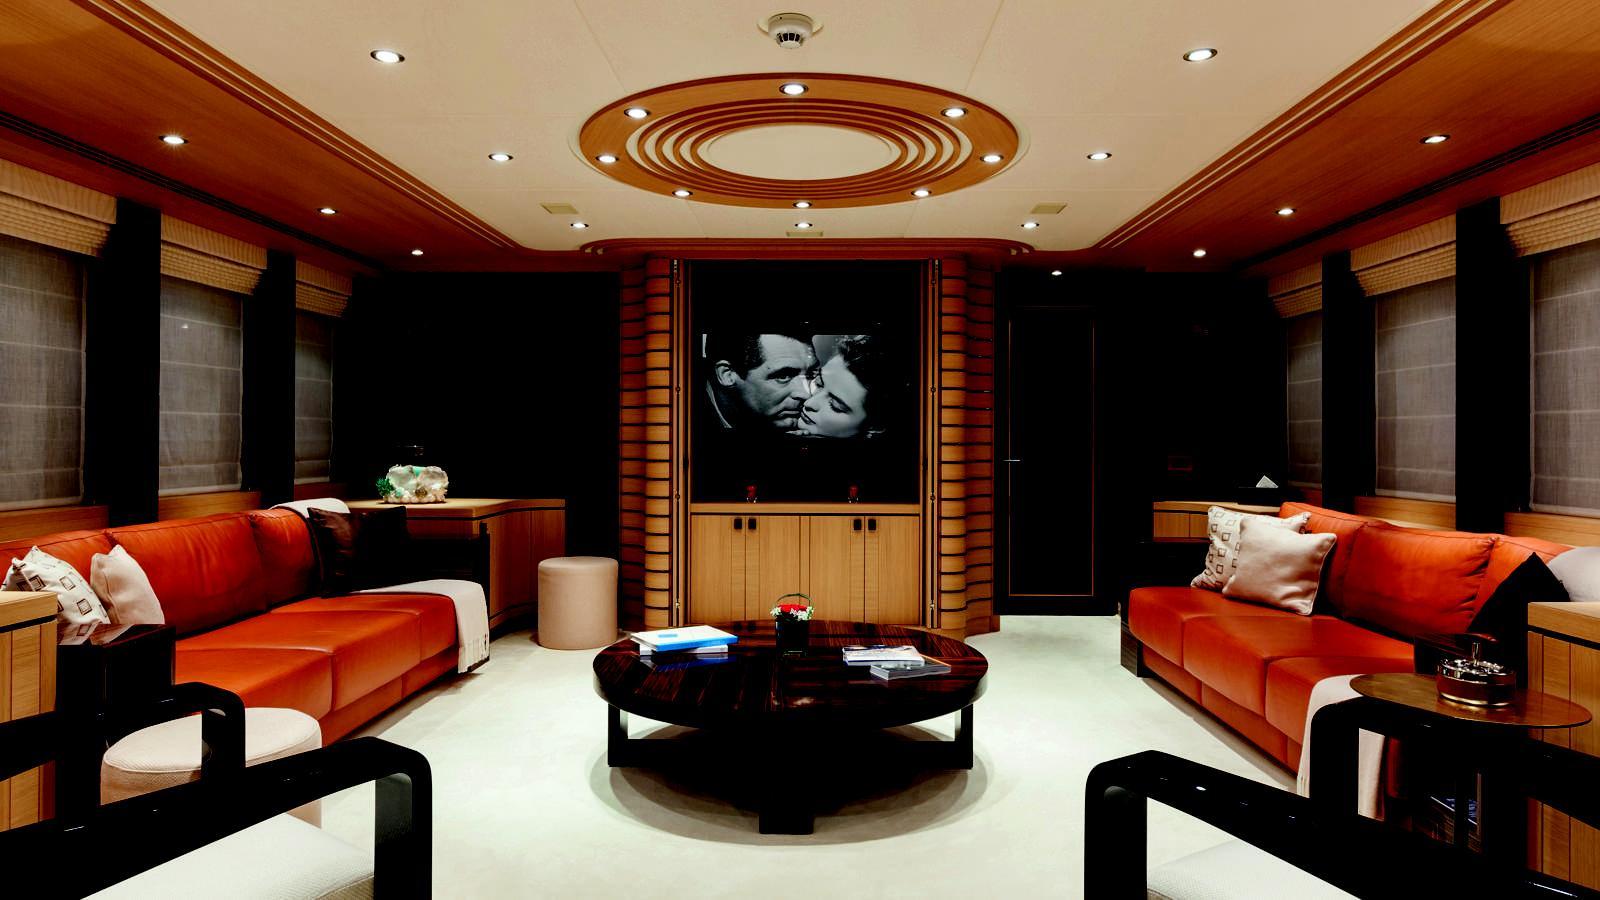 taurica-motor-yacht-heesen-2014-40m-cinema